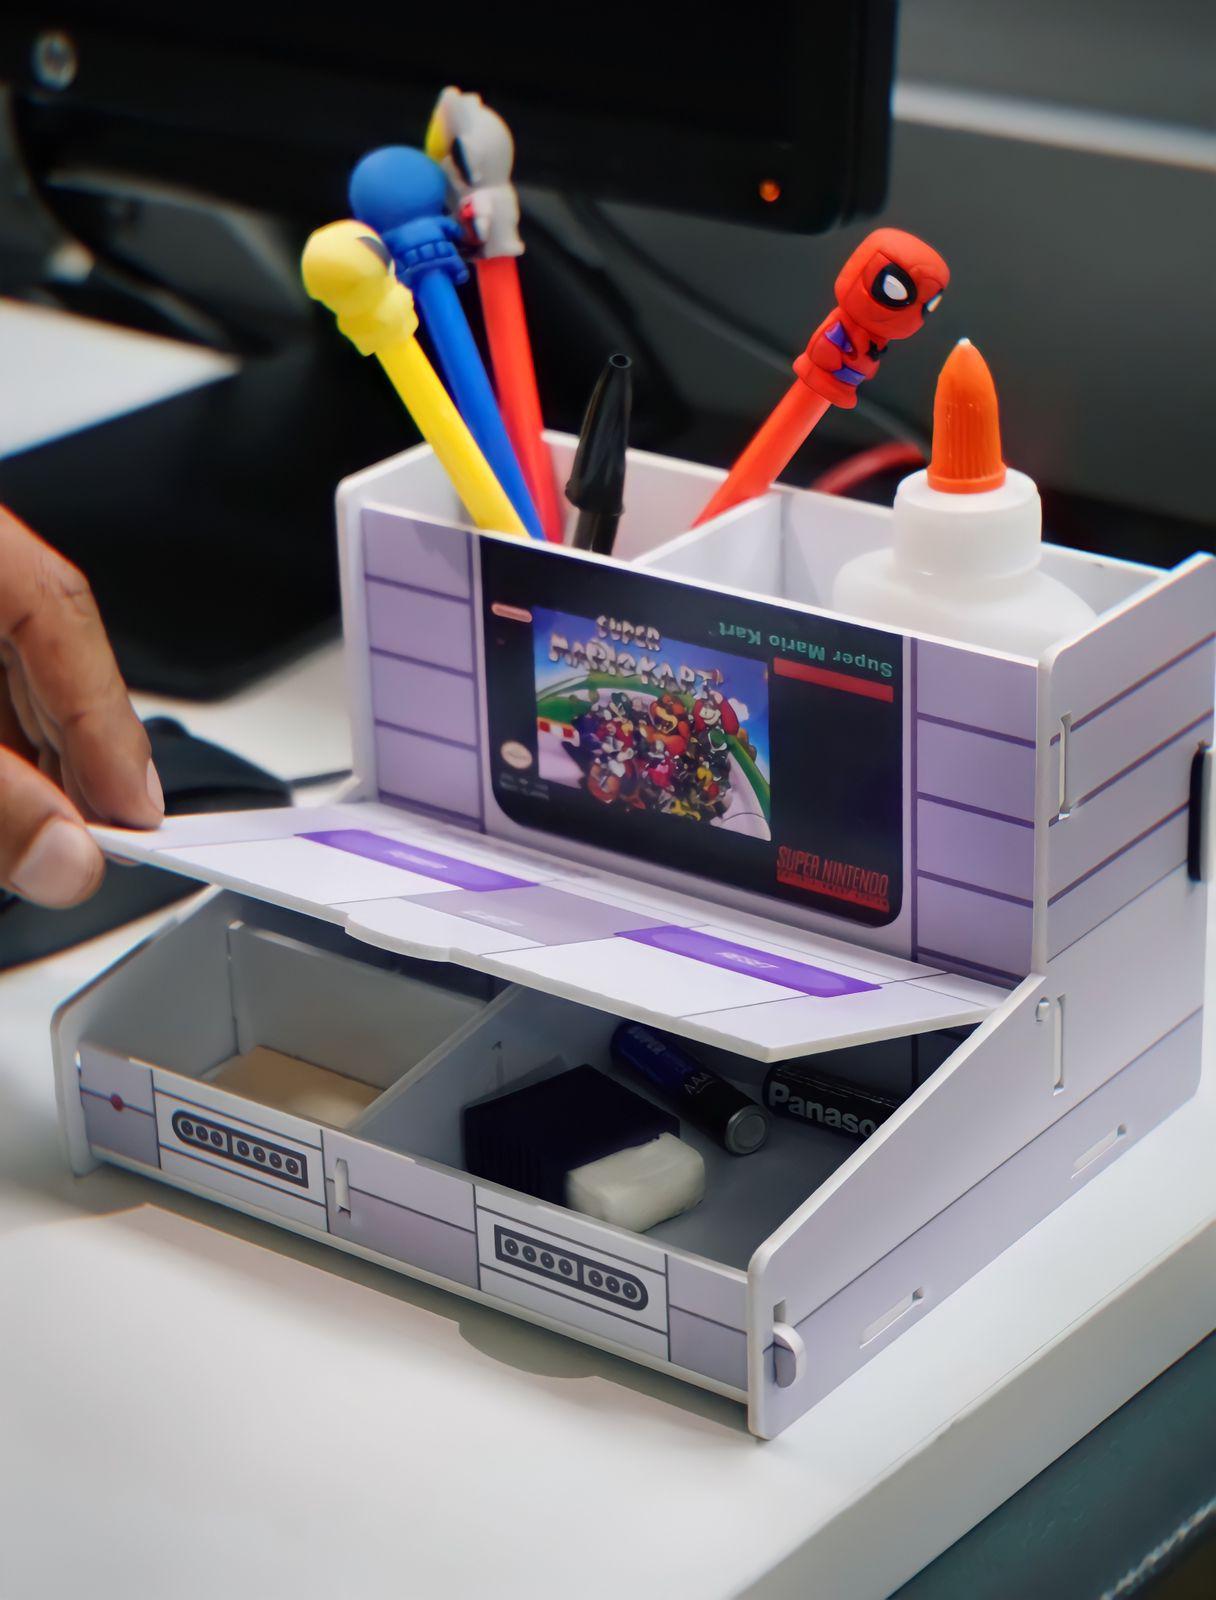 Porta Treco (Organizador de Escritório) Super Mario Kart - Nintendo - EV